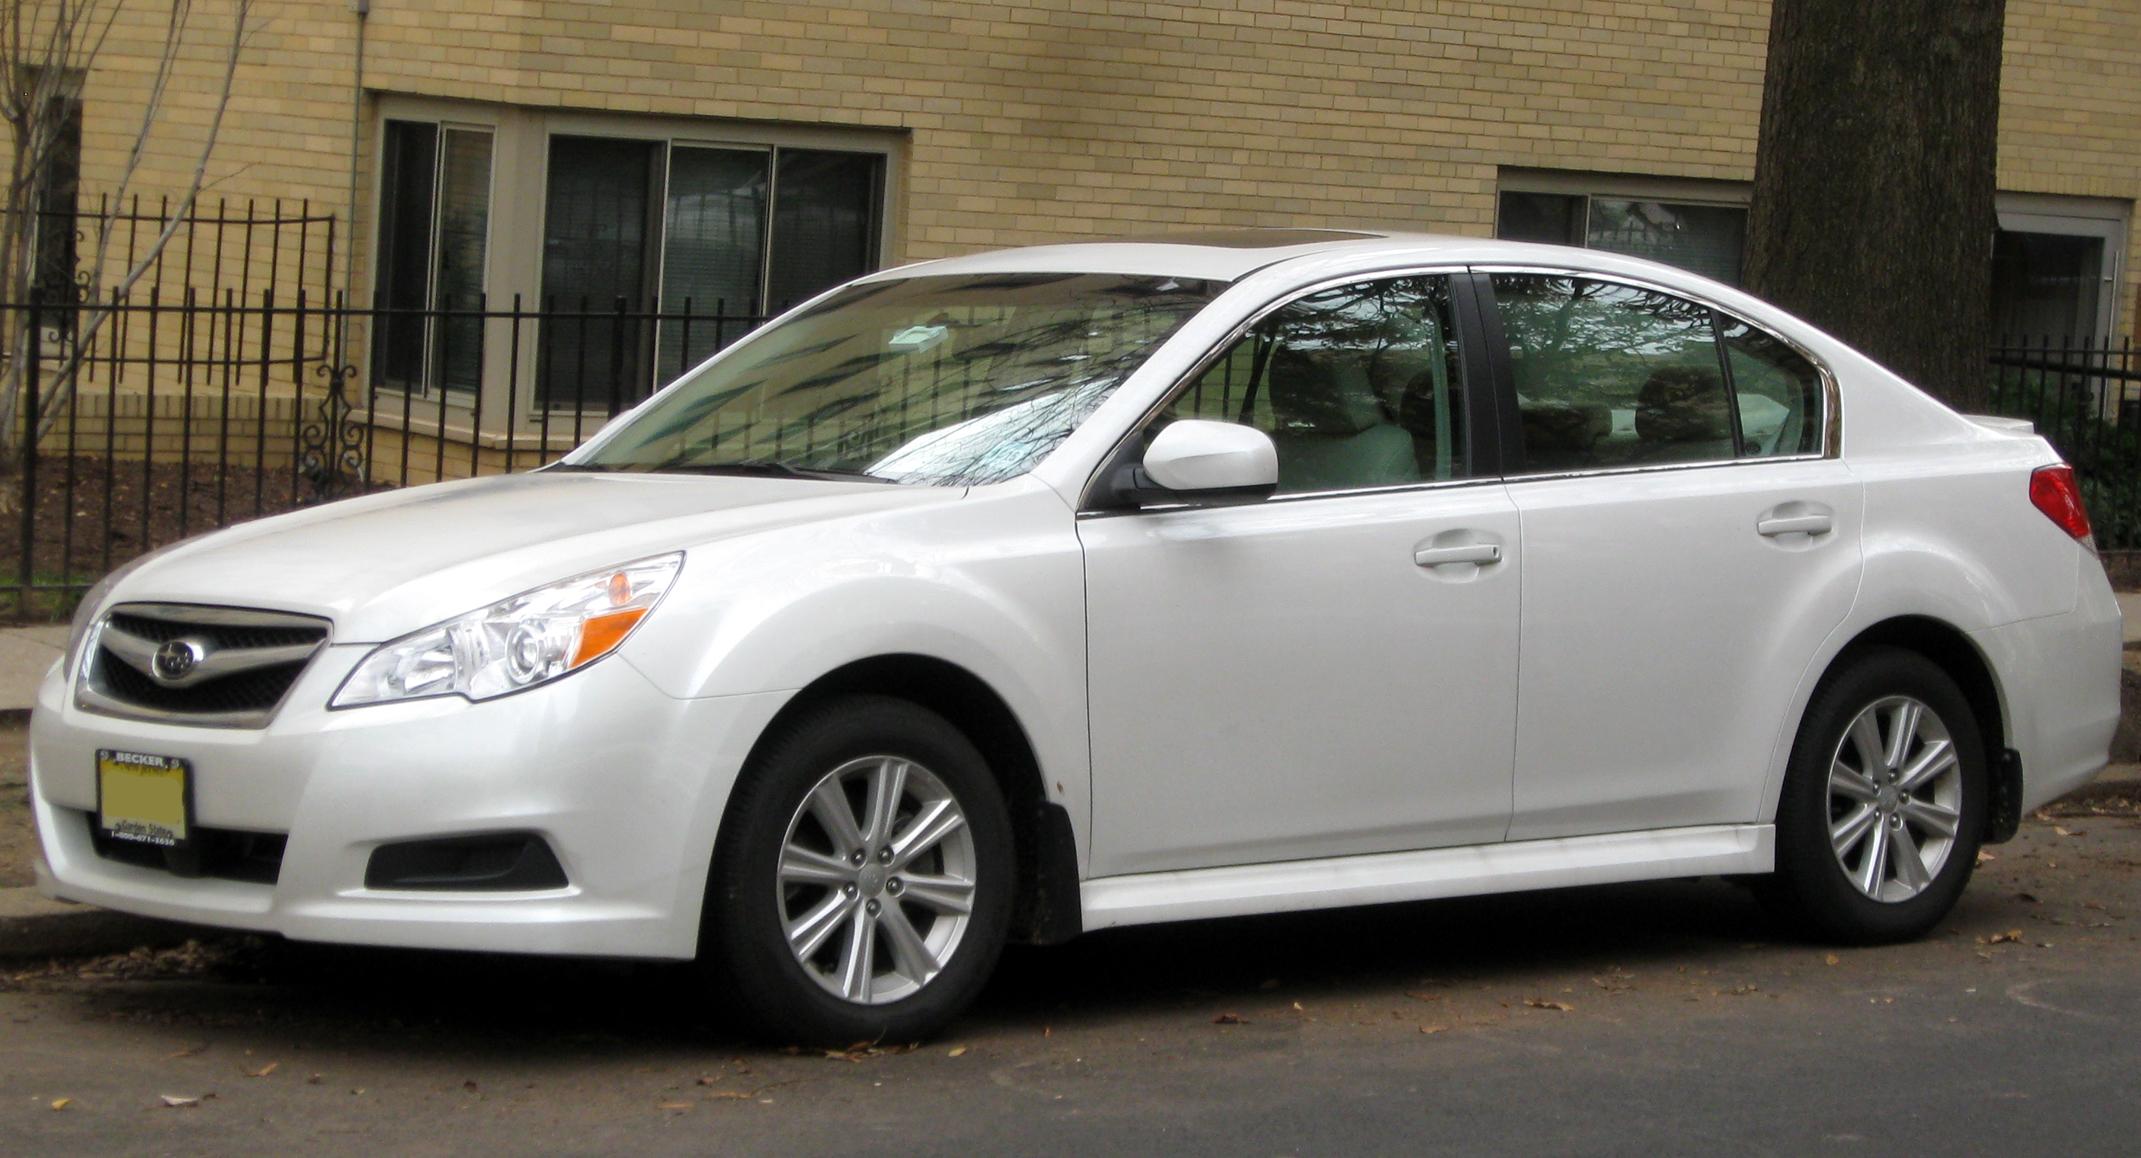 Depiction of Subaru Legacy